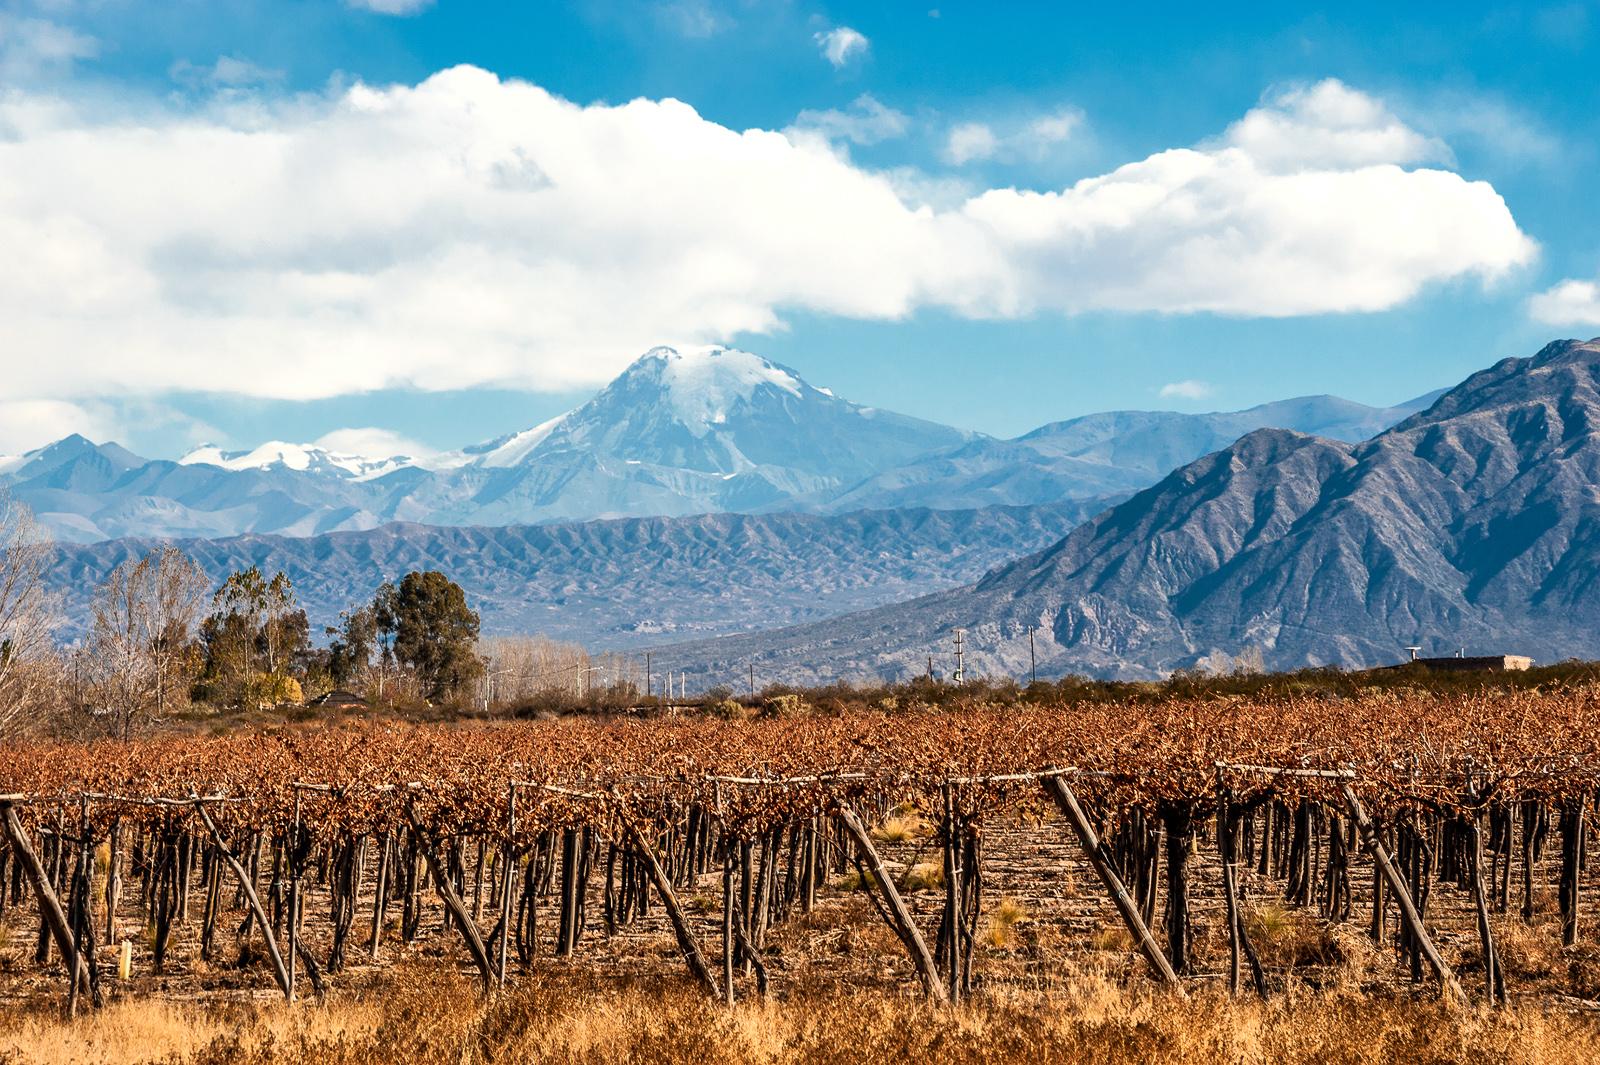 Aconcagua Volcano, Mendoza, Argentina